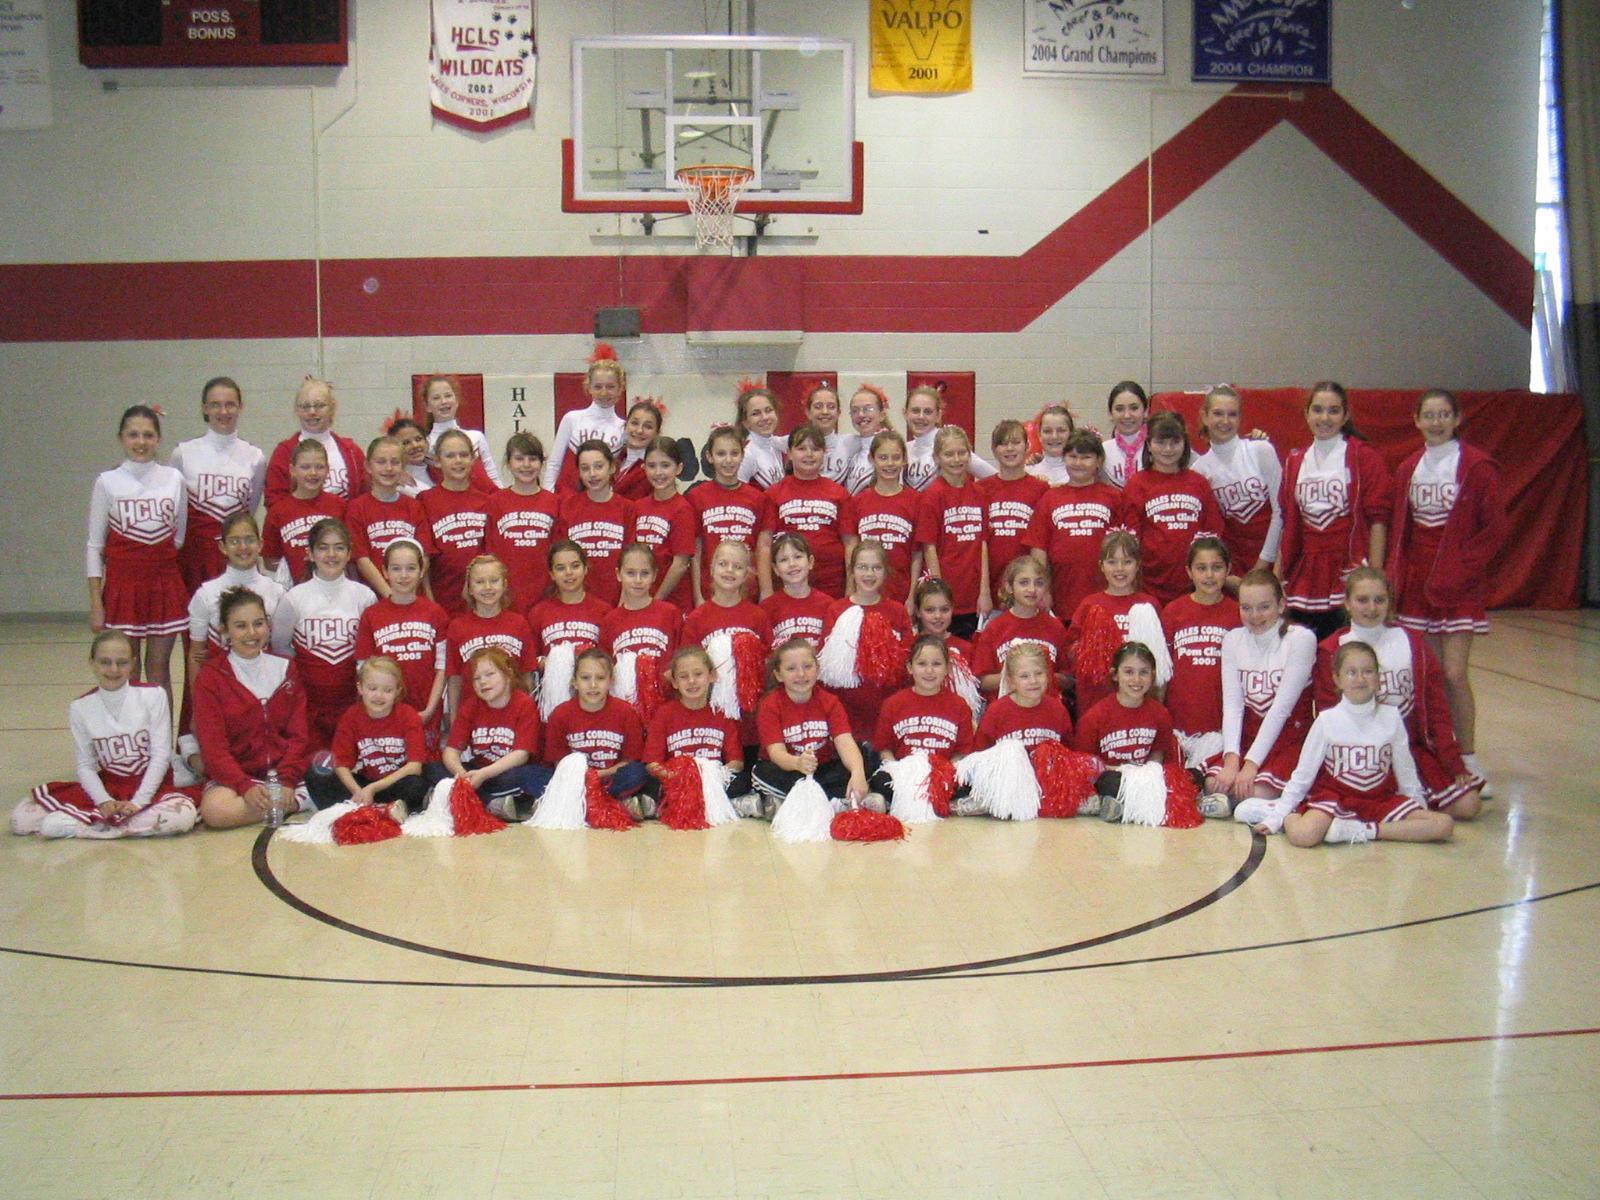 2005 Pom Clinic Team